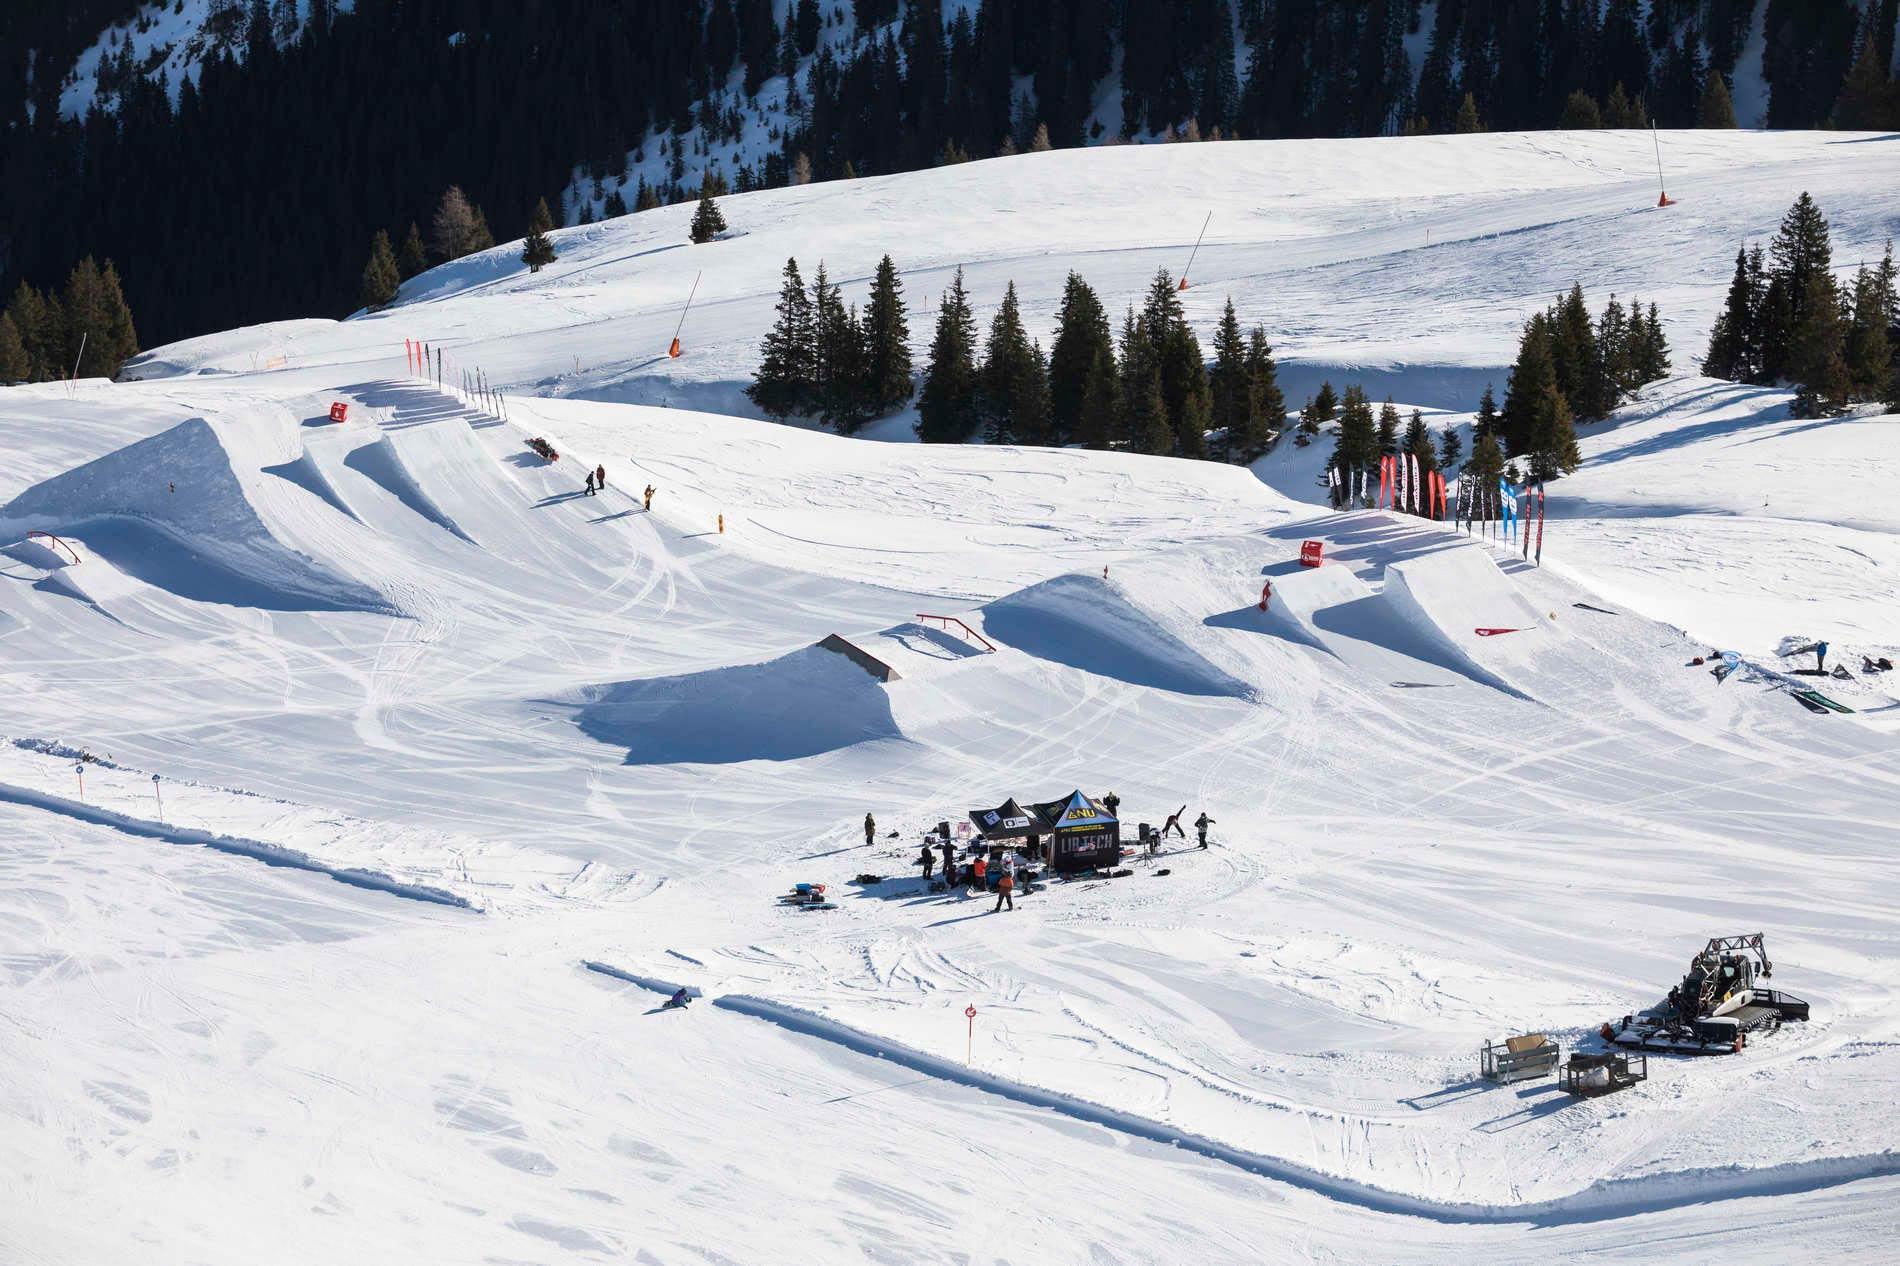 Das Contest Setup im Snowpark Kitzbühel. - Foto: Roland Haschka